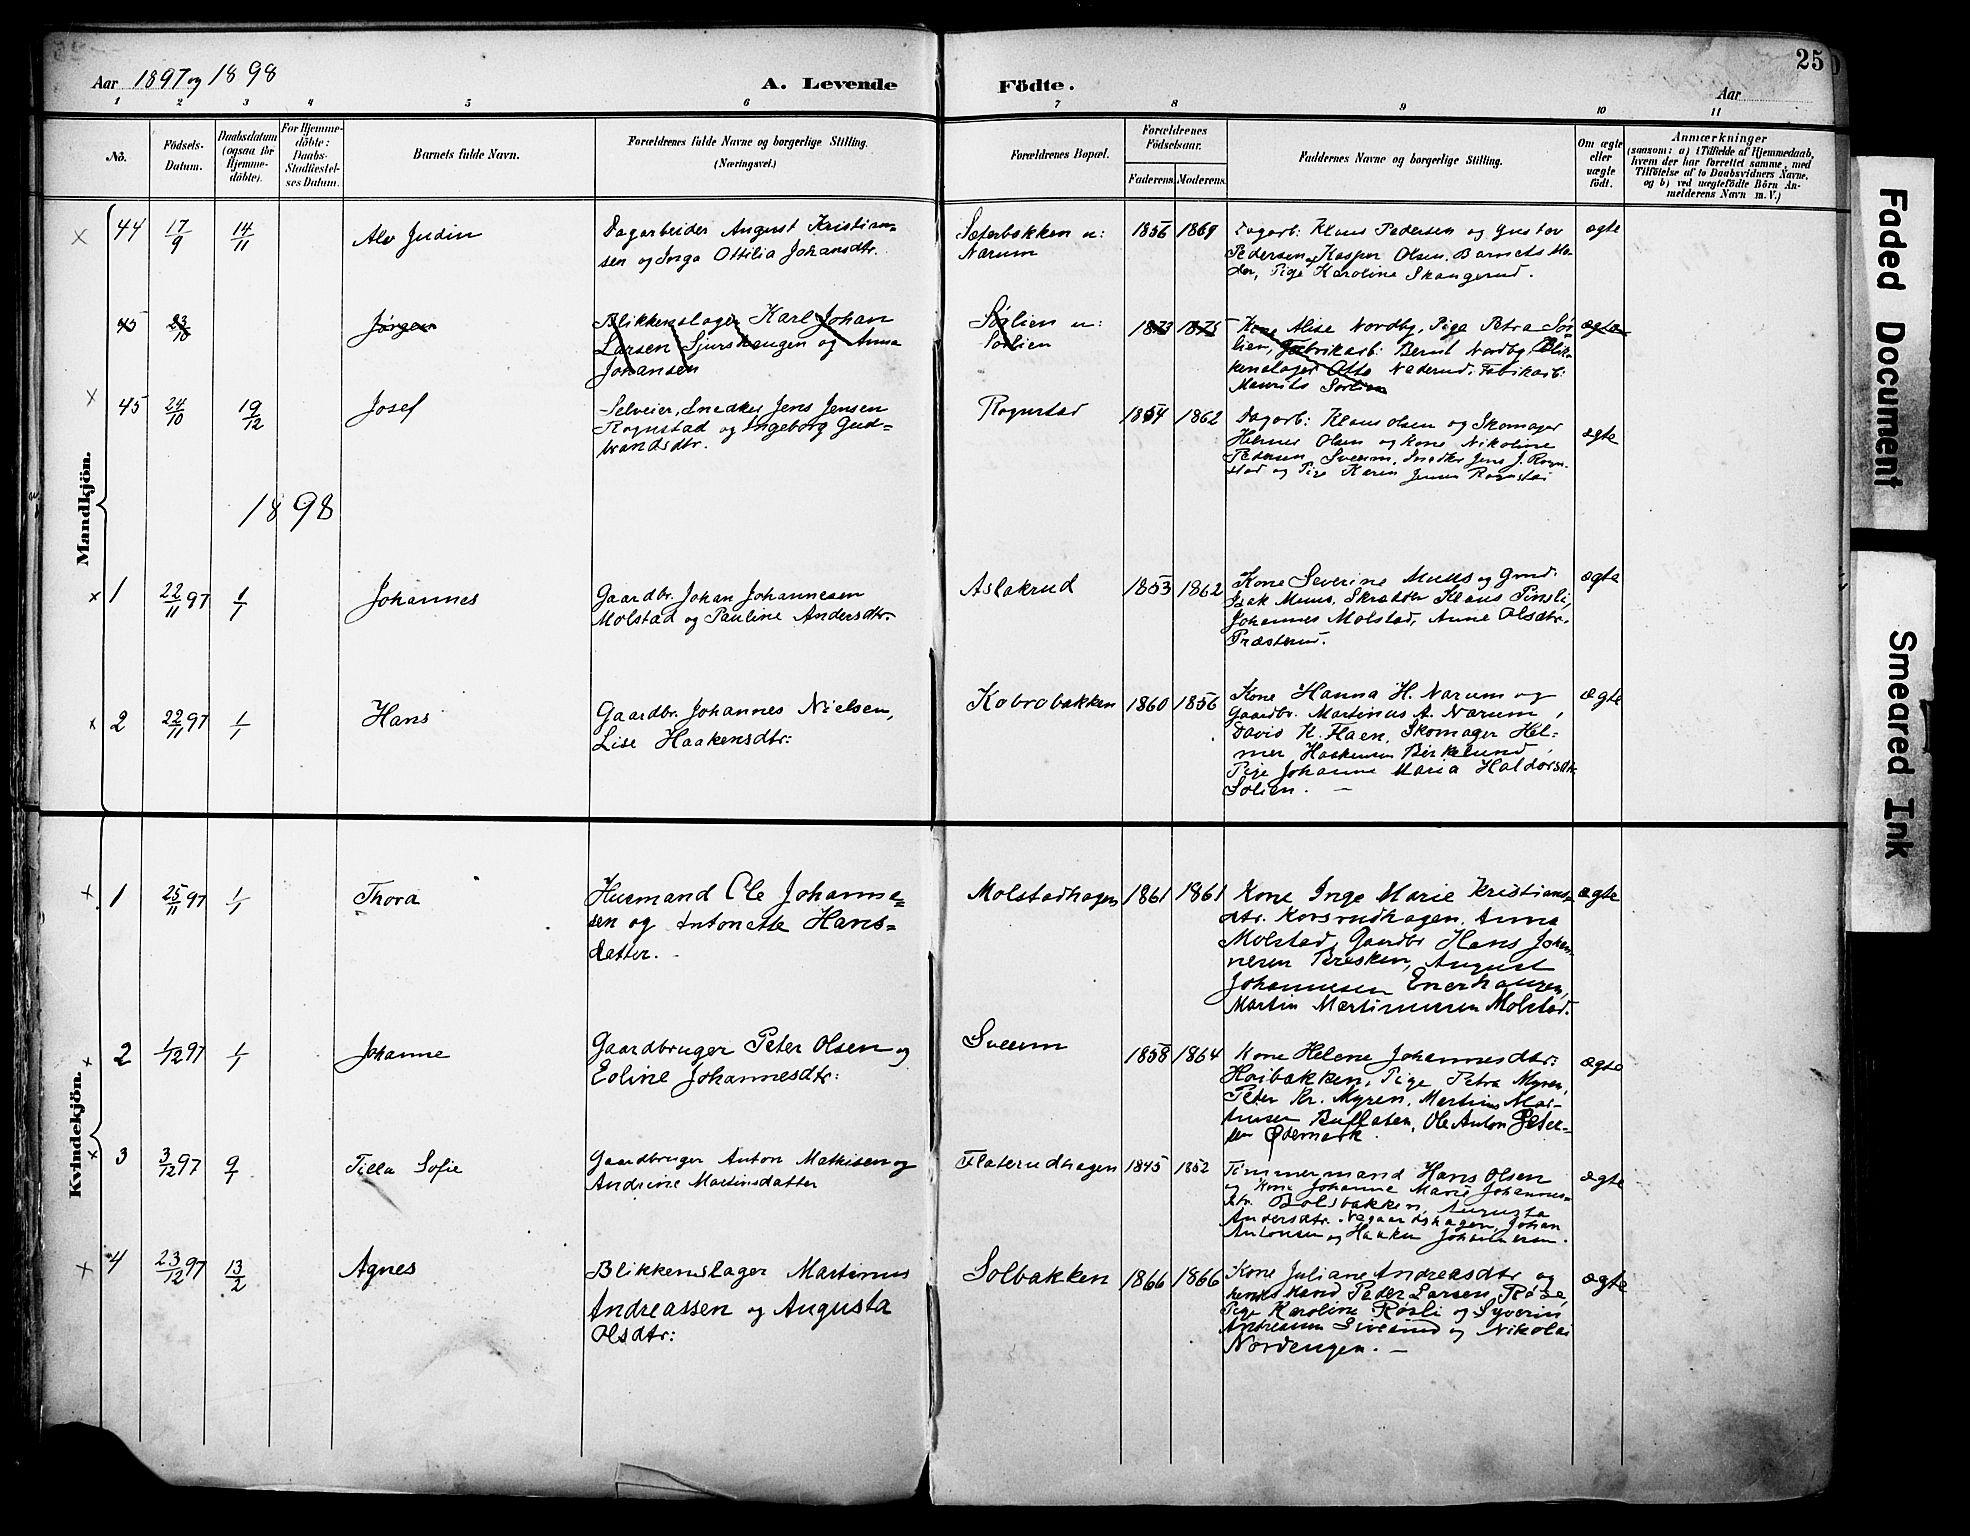 SAH, Vestre Toten prestekontor, H/Ha/Haa/L0013: Ministerialbok nr. 13, 1895-1911, s. 25